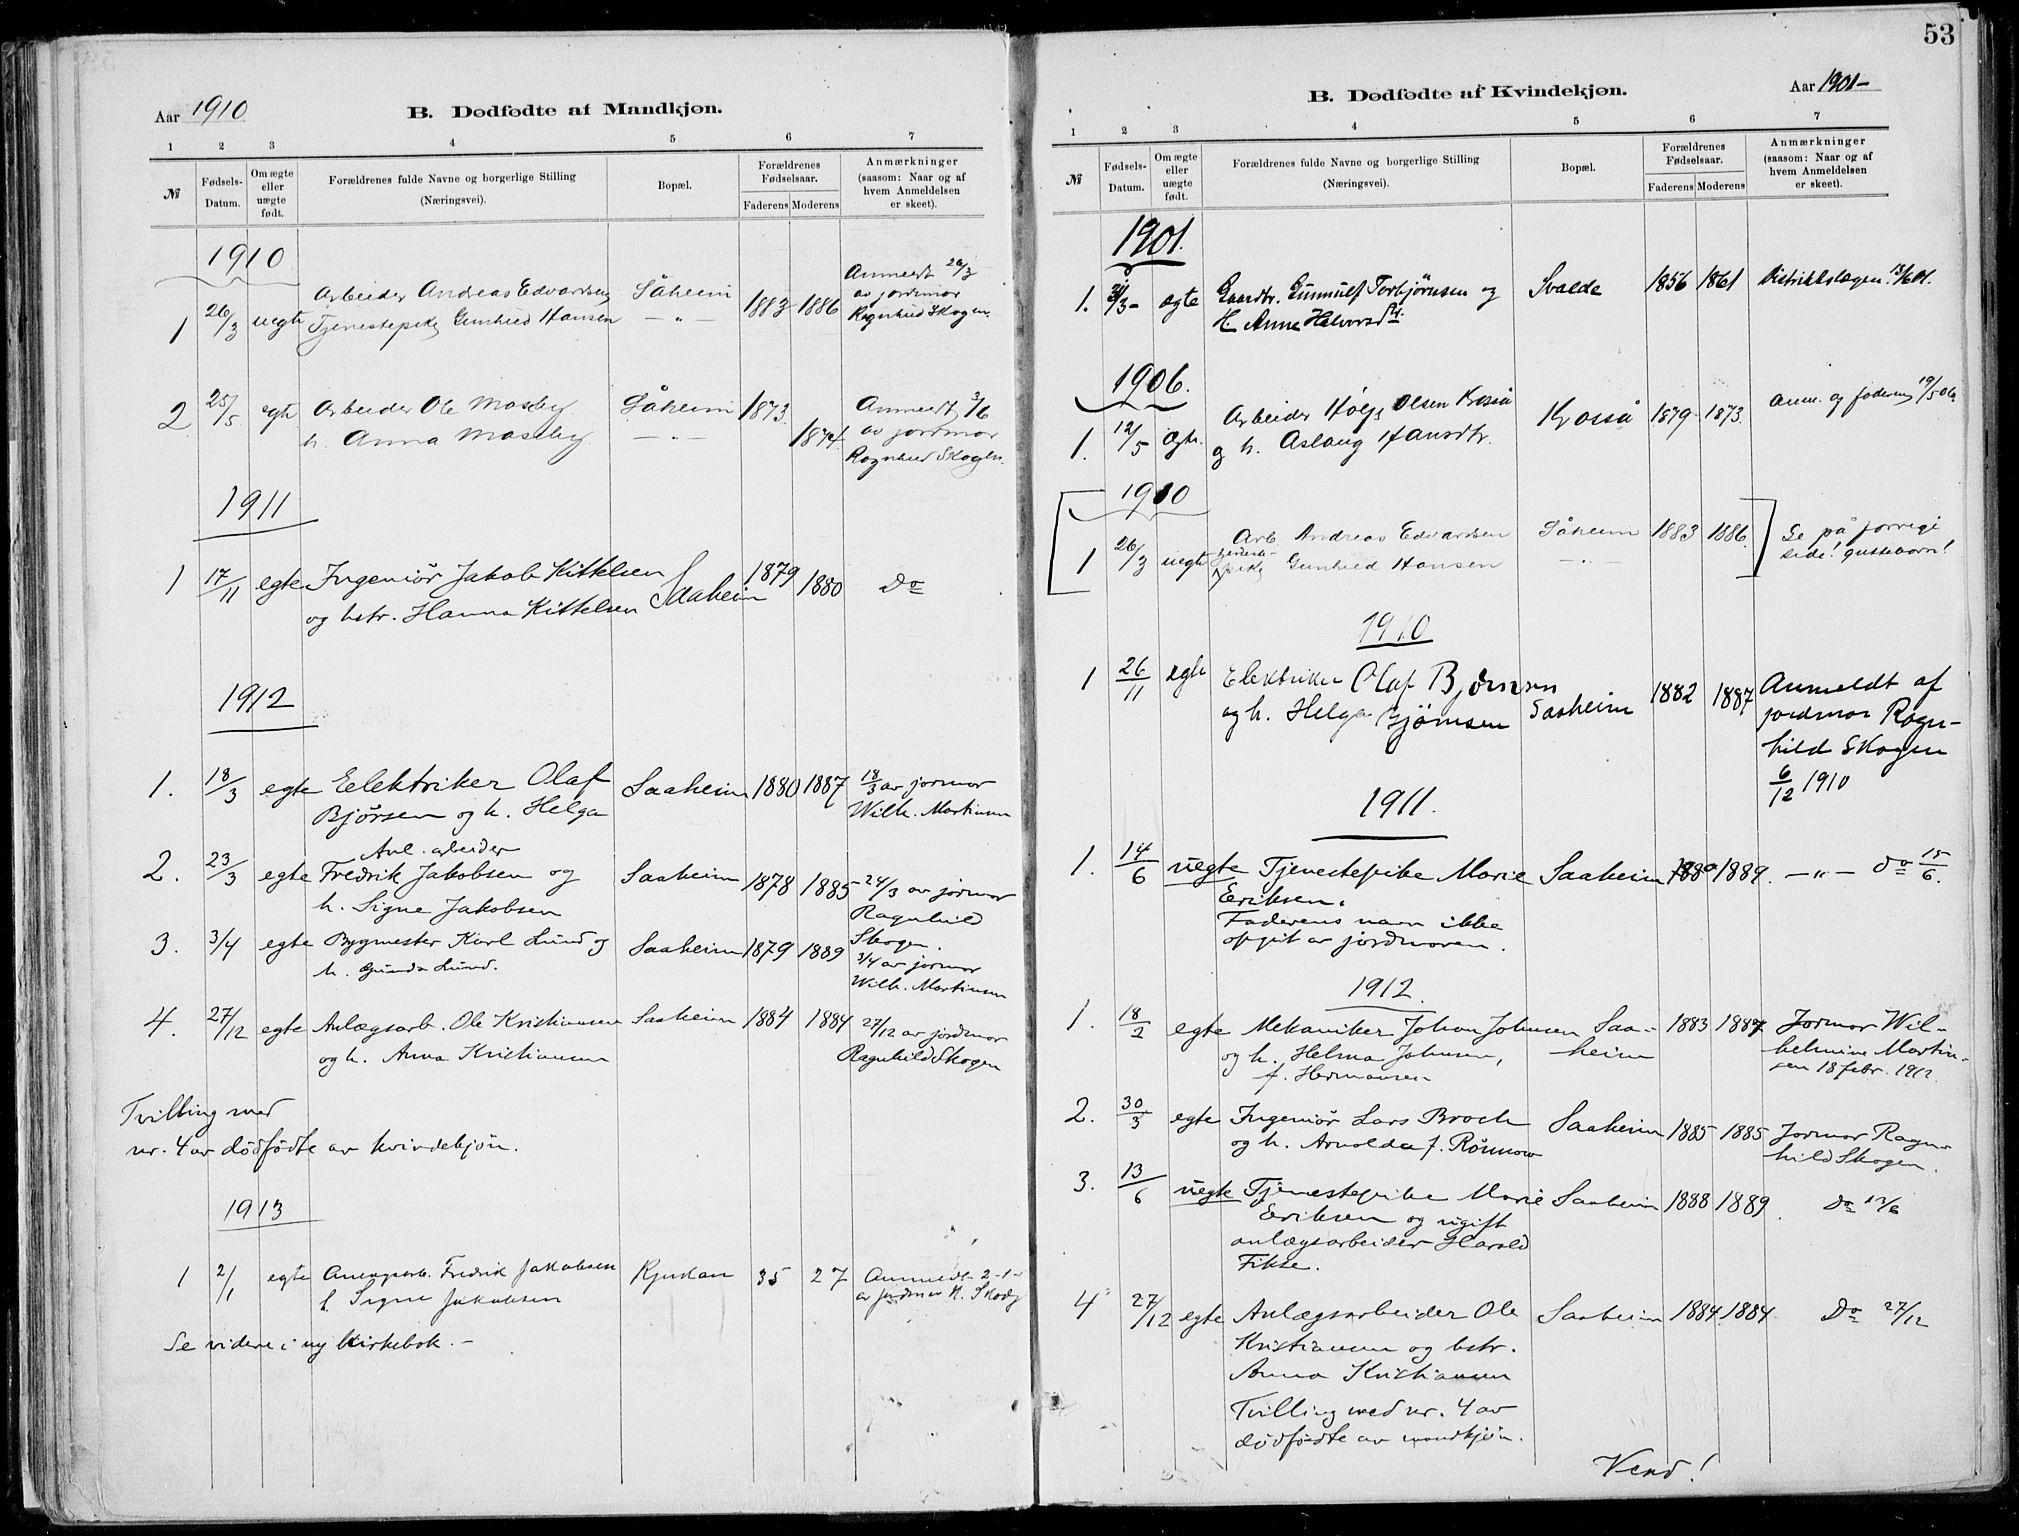 SAKO, Rjukan kirkebøker, F/Fa/L0001: Ministerialbok nr. 1, 1878-1912, s. 53